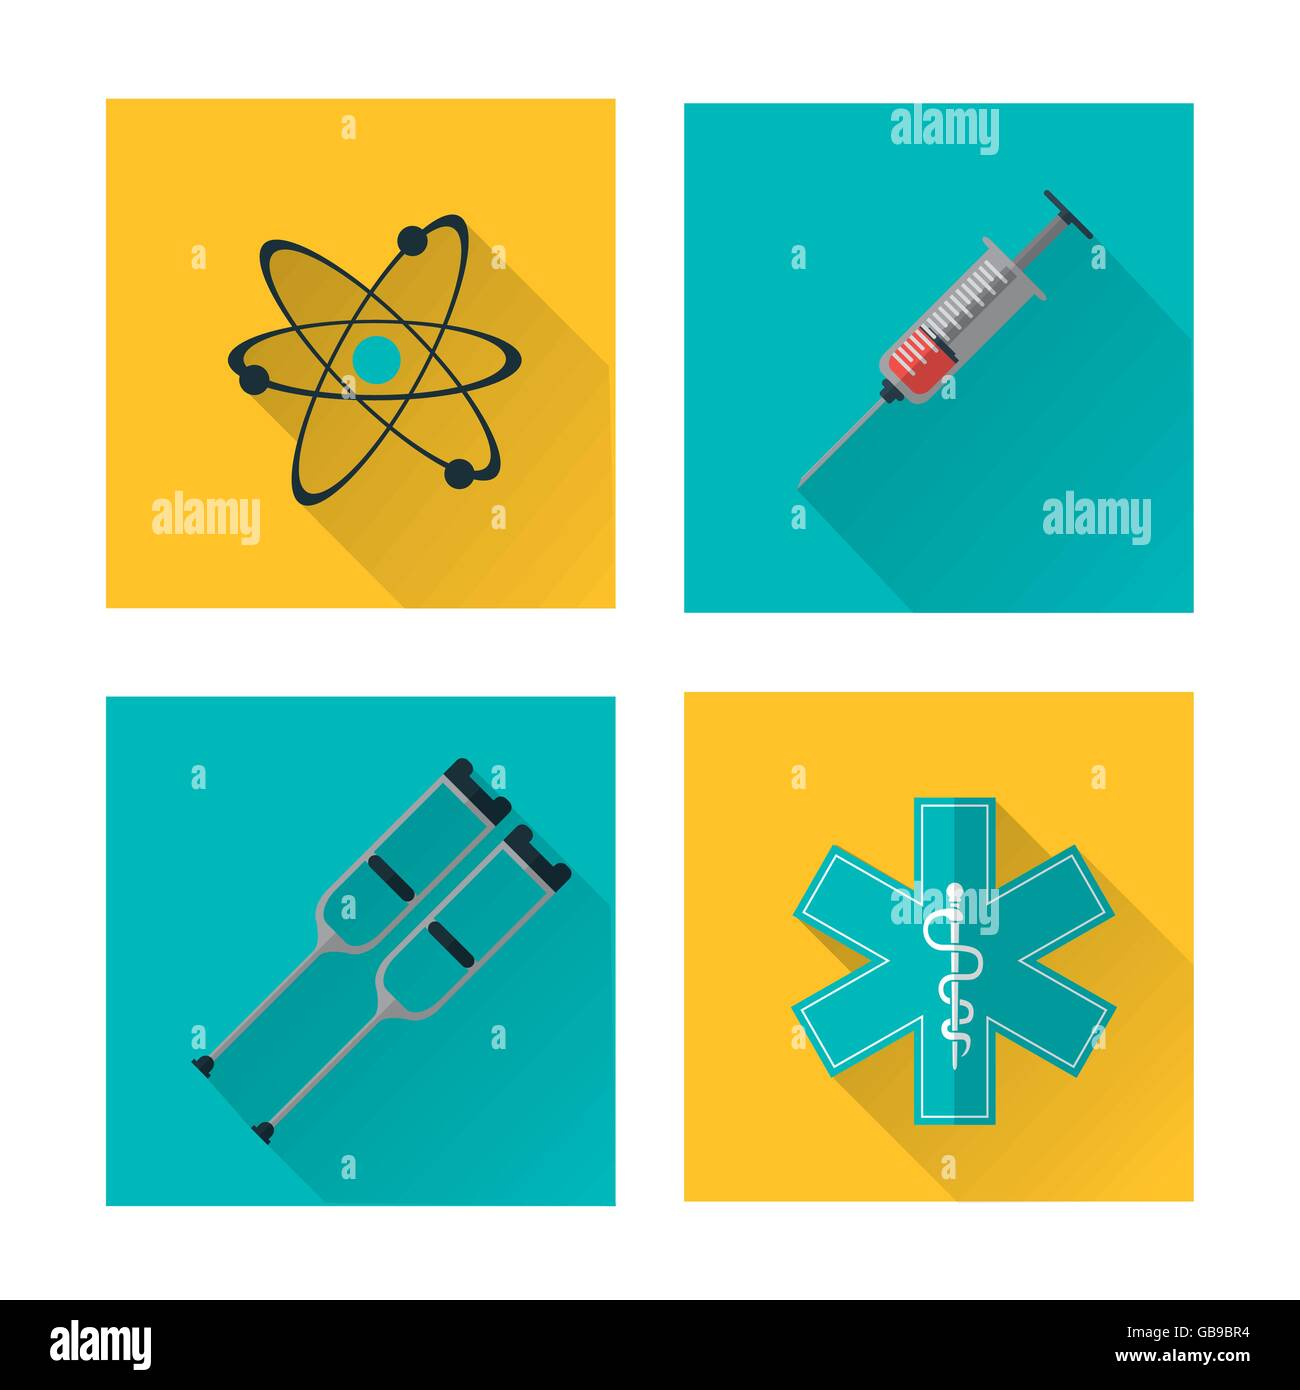 Crutches Stockfotos & Crutches Bilder - Seite 67 - Alamy